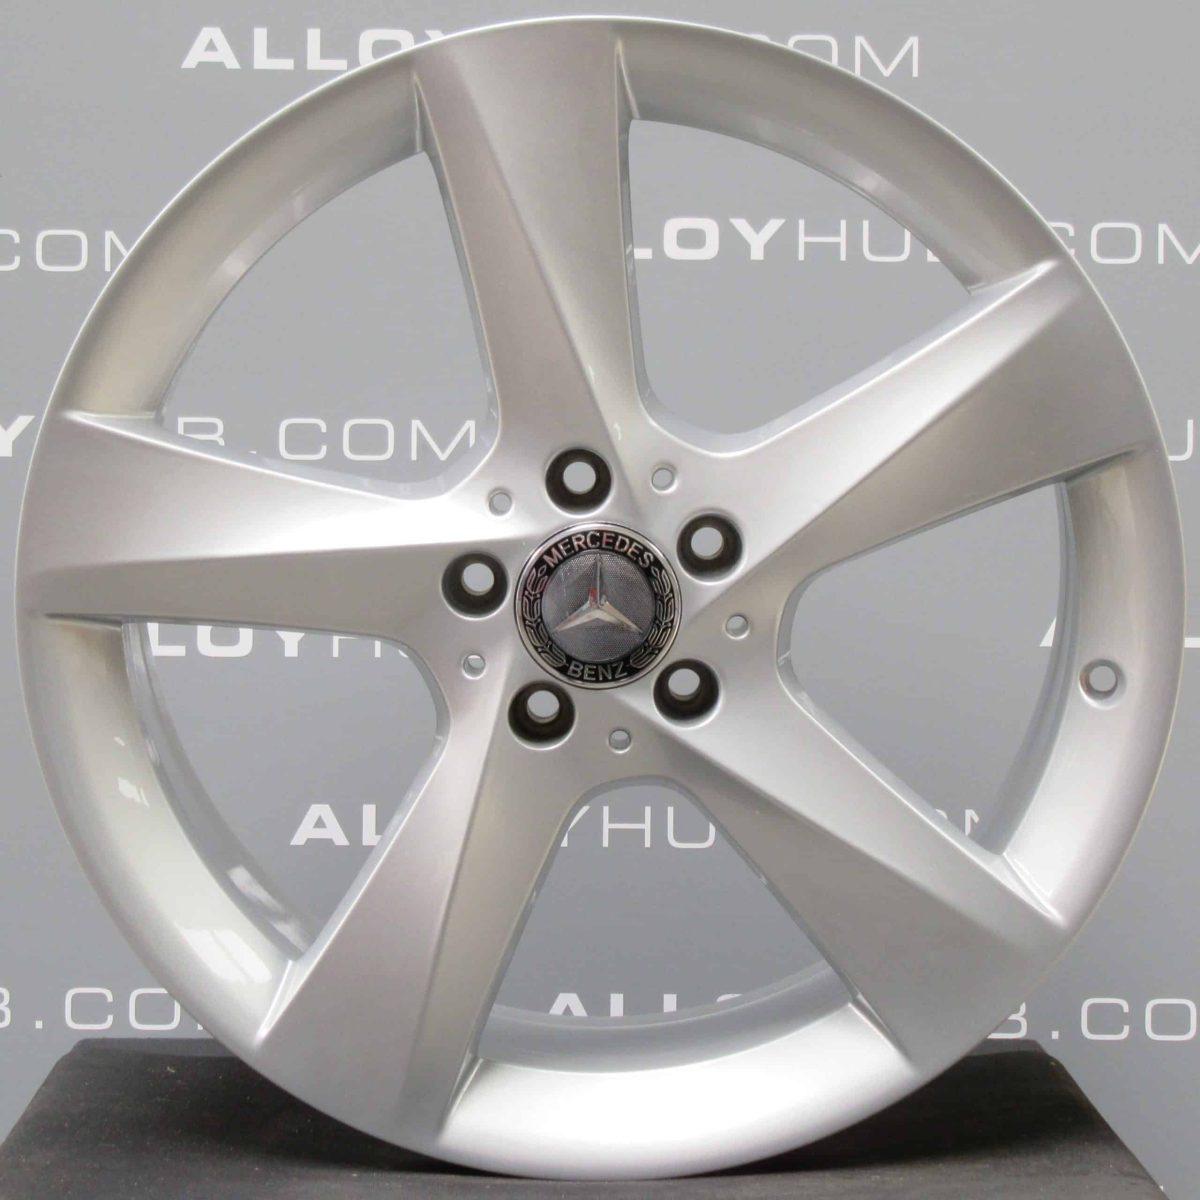 "Genuine Mercedes-Benz ML GLE W166 19"" inch 5 Spoke Alloy Wheels with Silver Finish A1664010202"